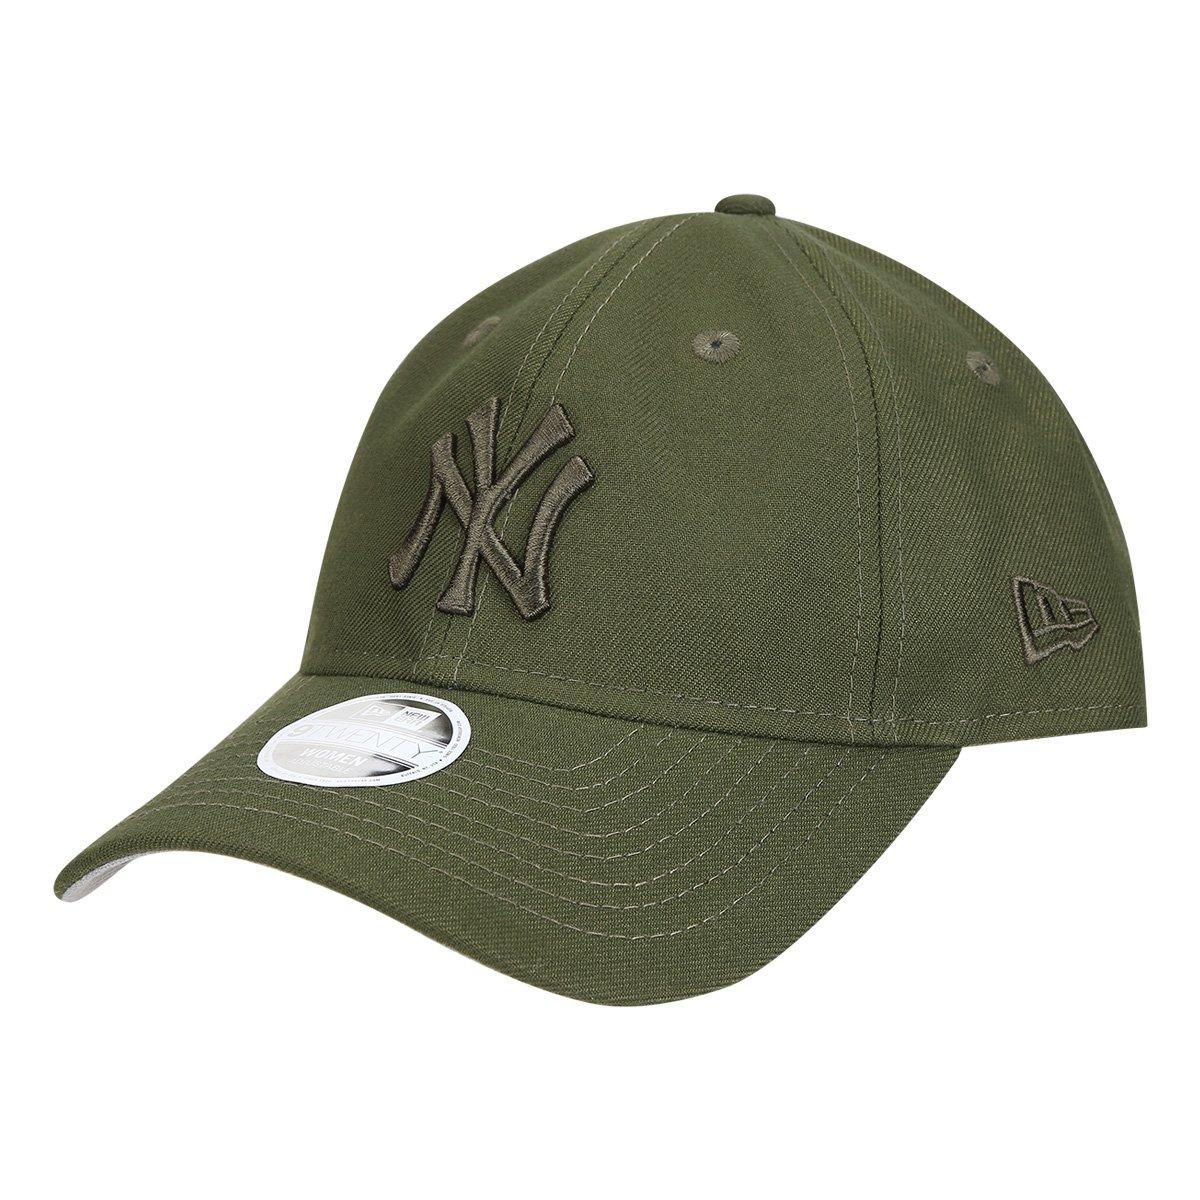 Boné New Era MLB New York Yankees Aba Curva 920 Rifle Green Tonal ... 79b82849cda5b